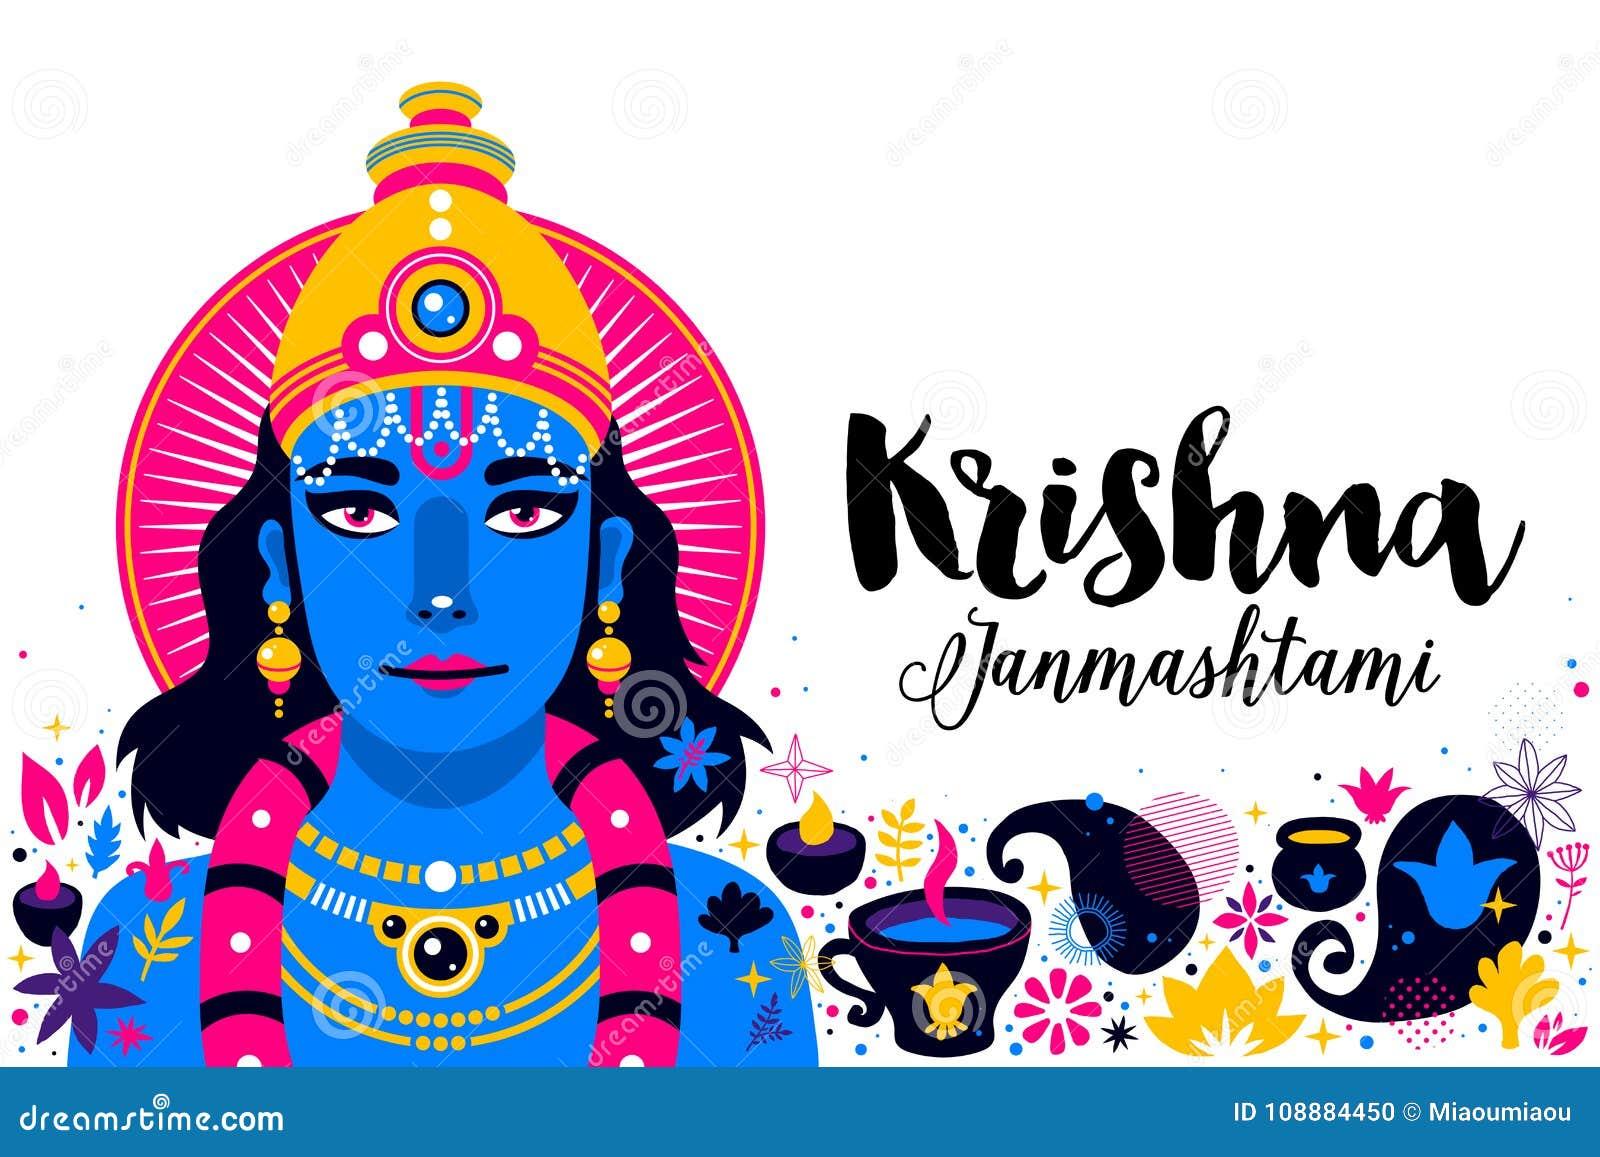 krishna janmashtami advertising template modern style